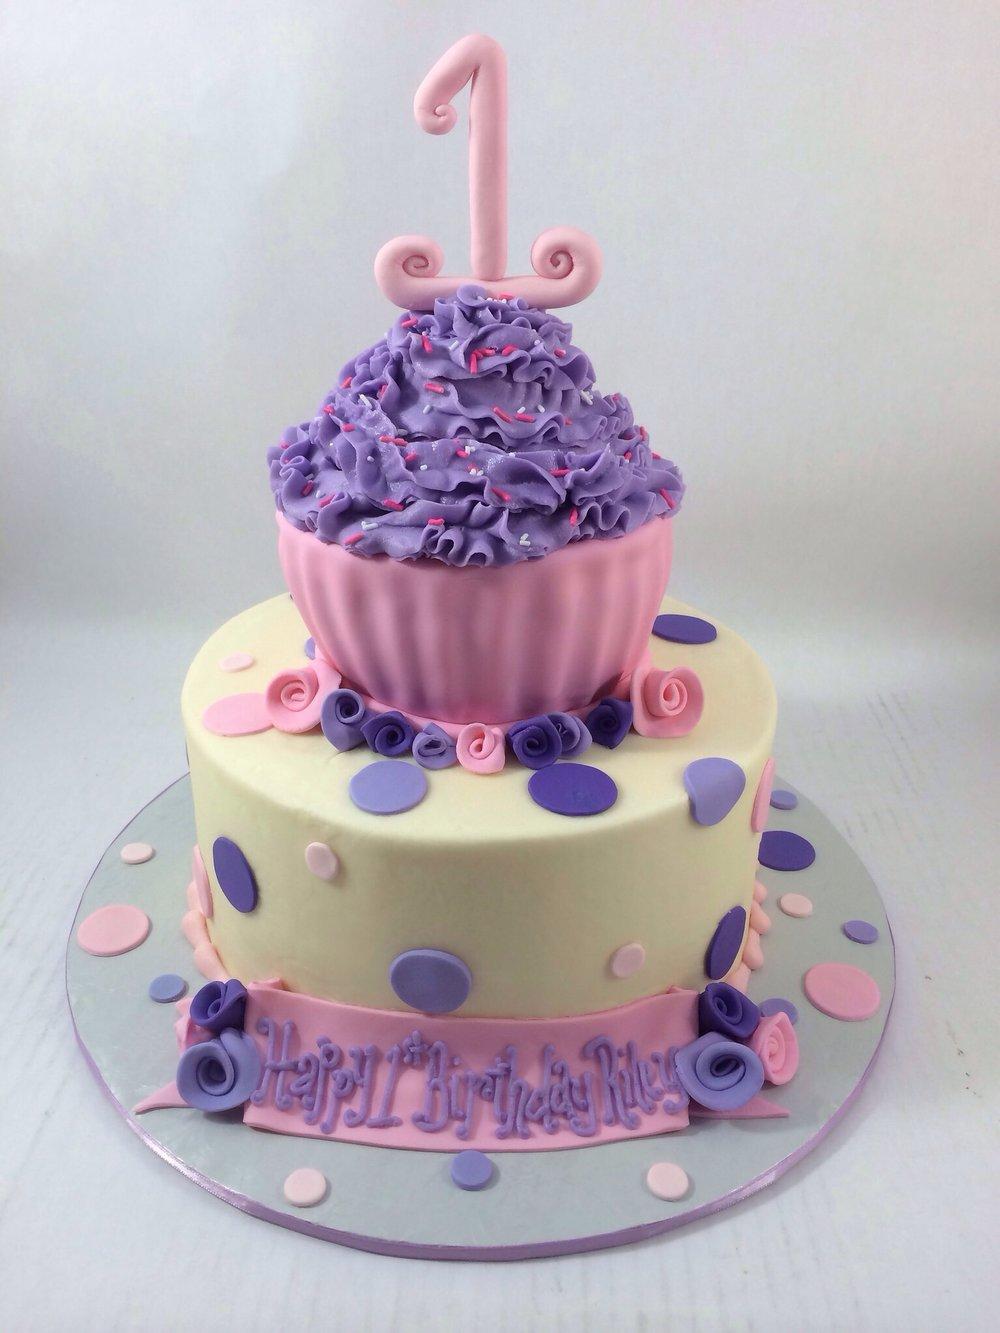 Cake 1st bday cupcake on top.JPG